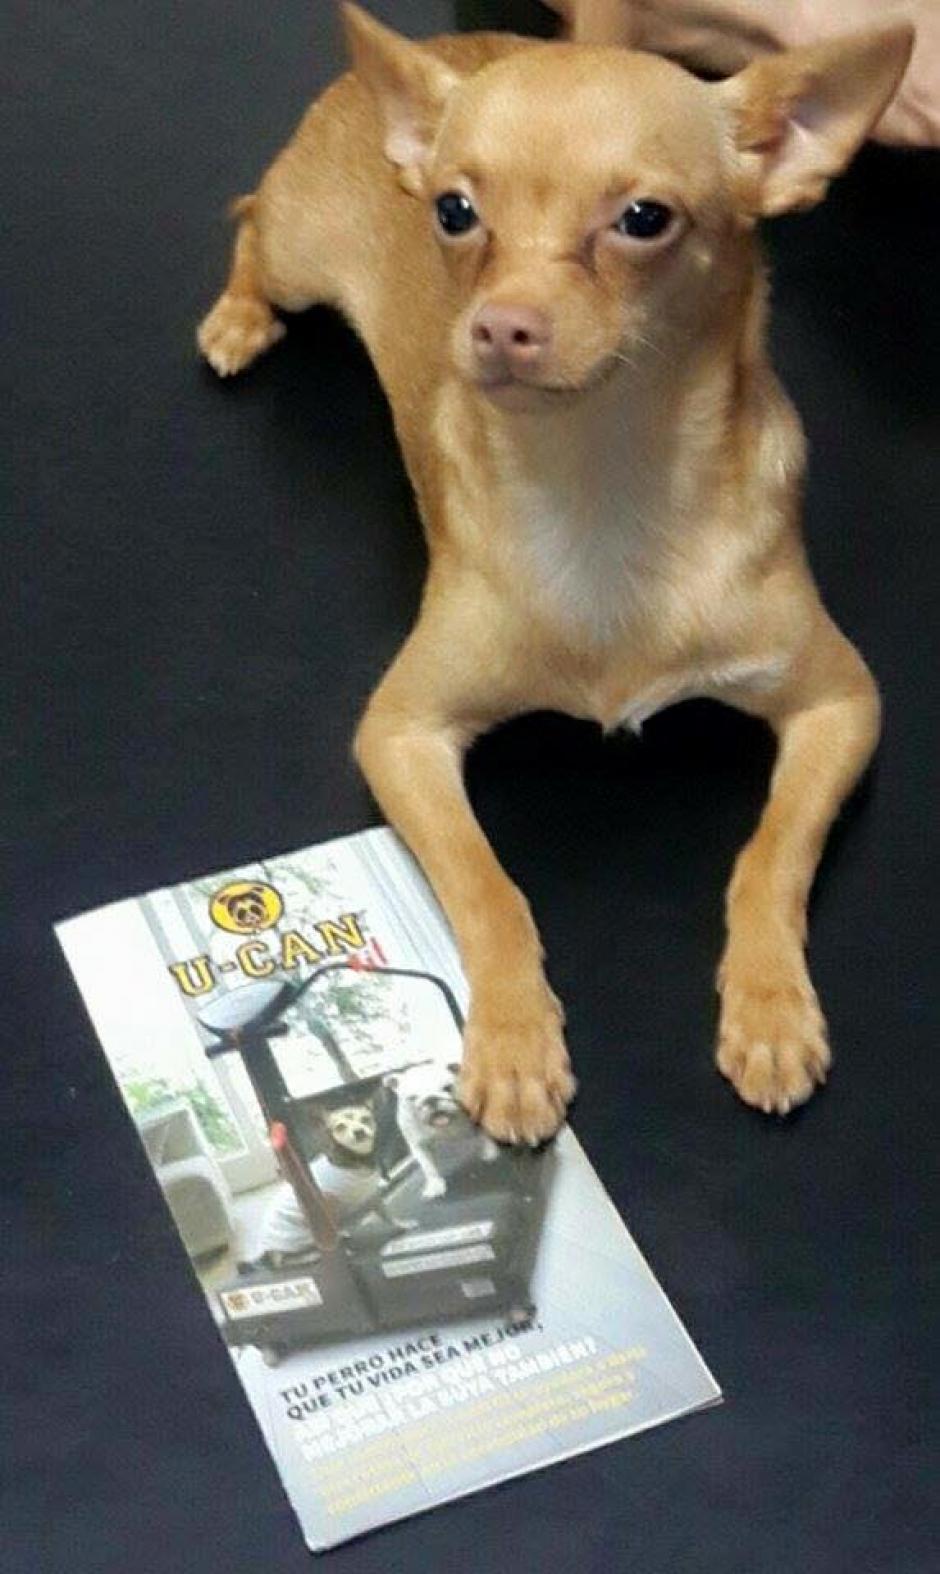 El famoso chihuahua asiste a su entrenamiento religiosamente. (Foto: Albergue Municipal de Mascotas zona 21)